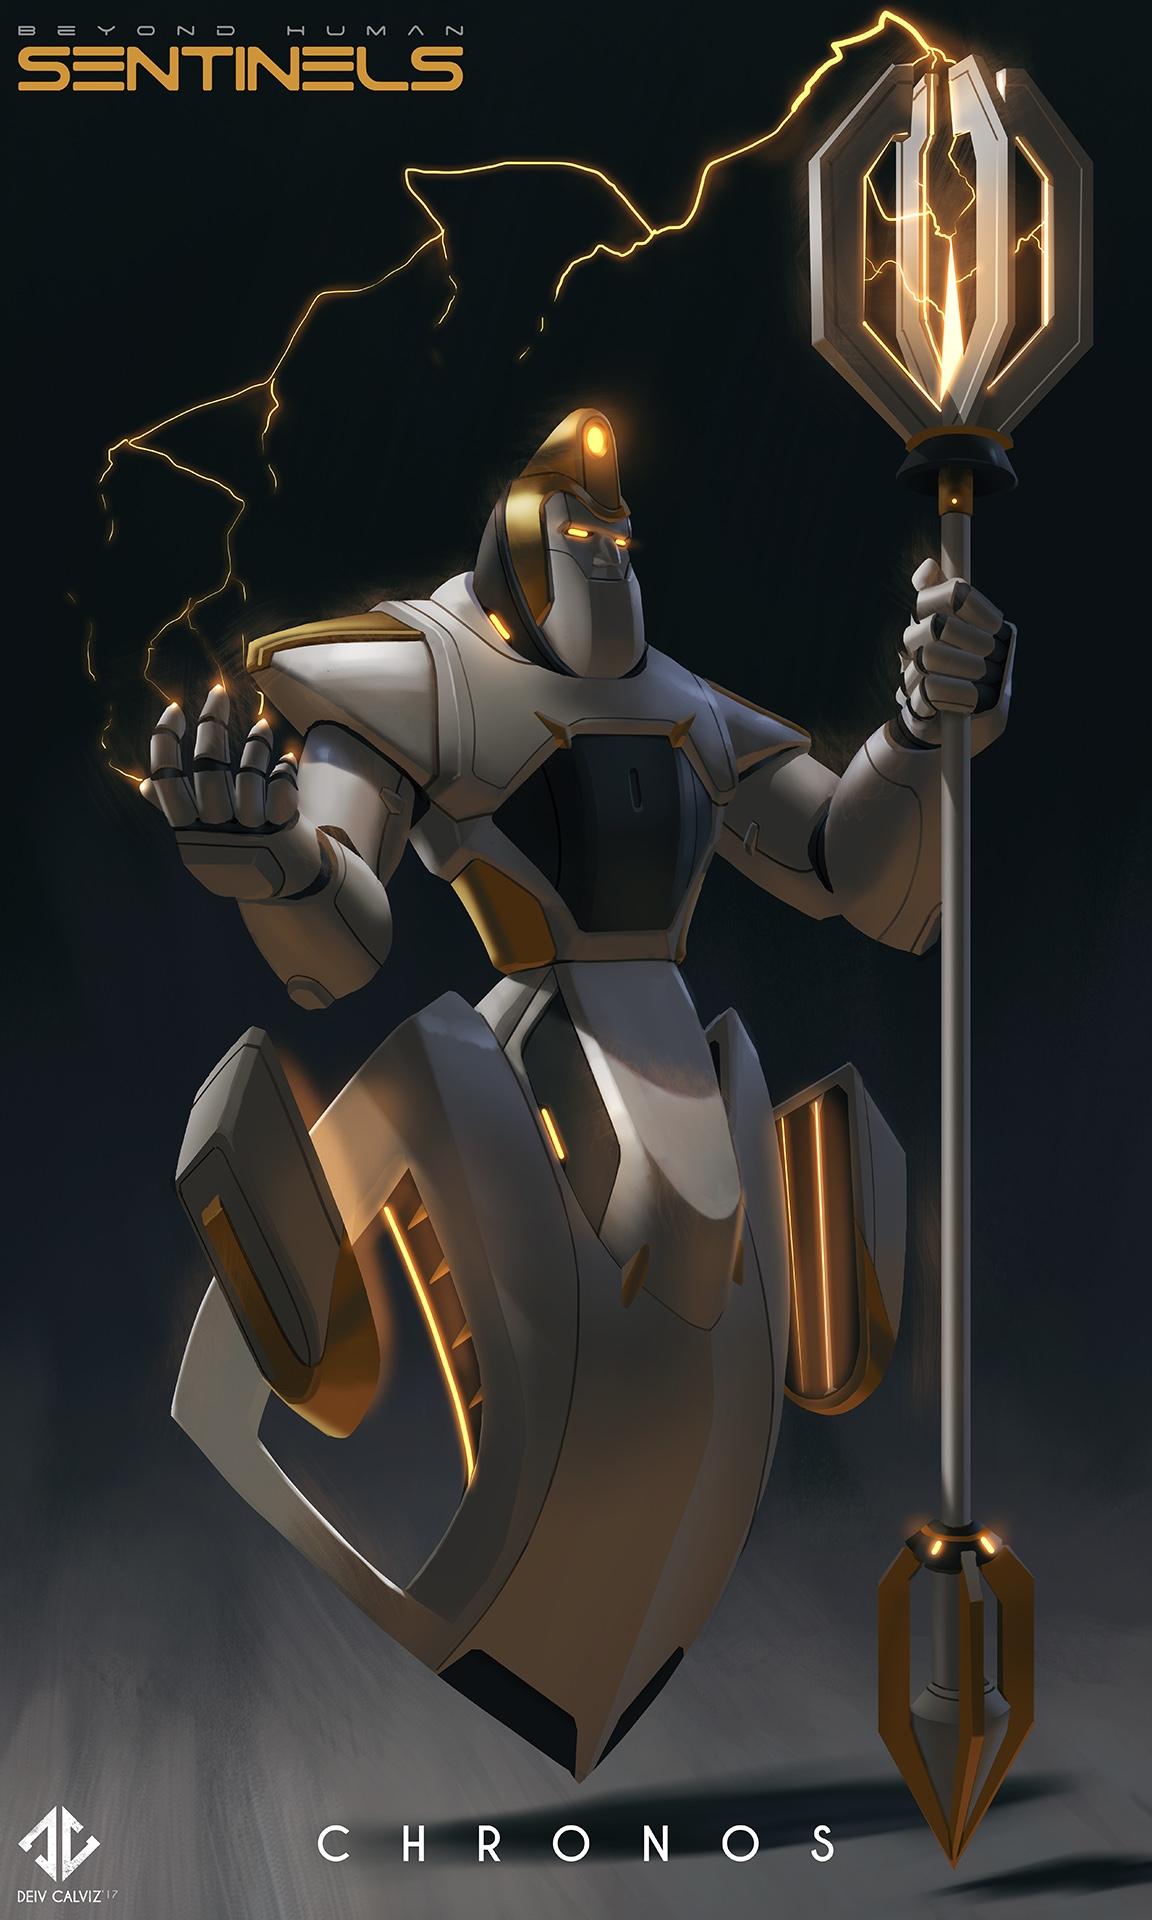 Sentinels_5_Chronos